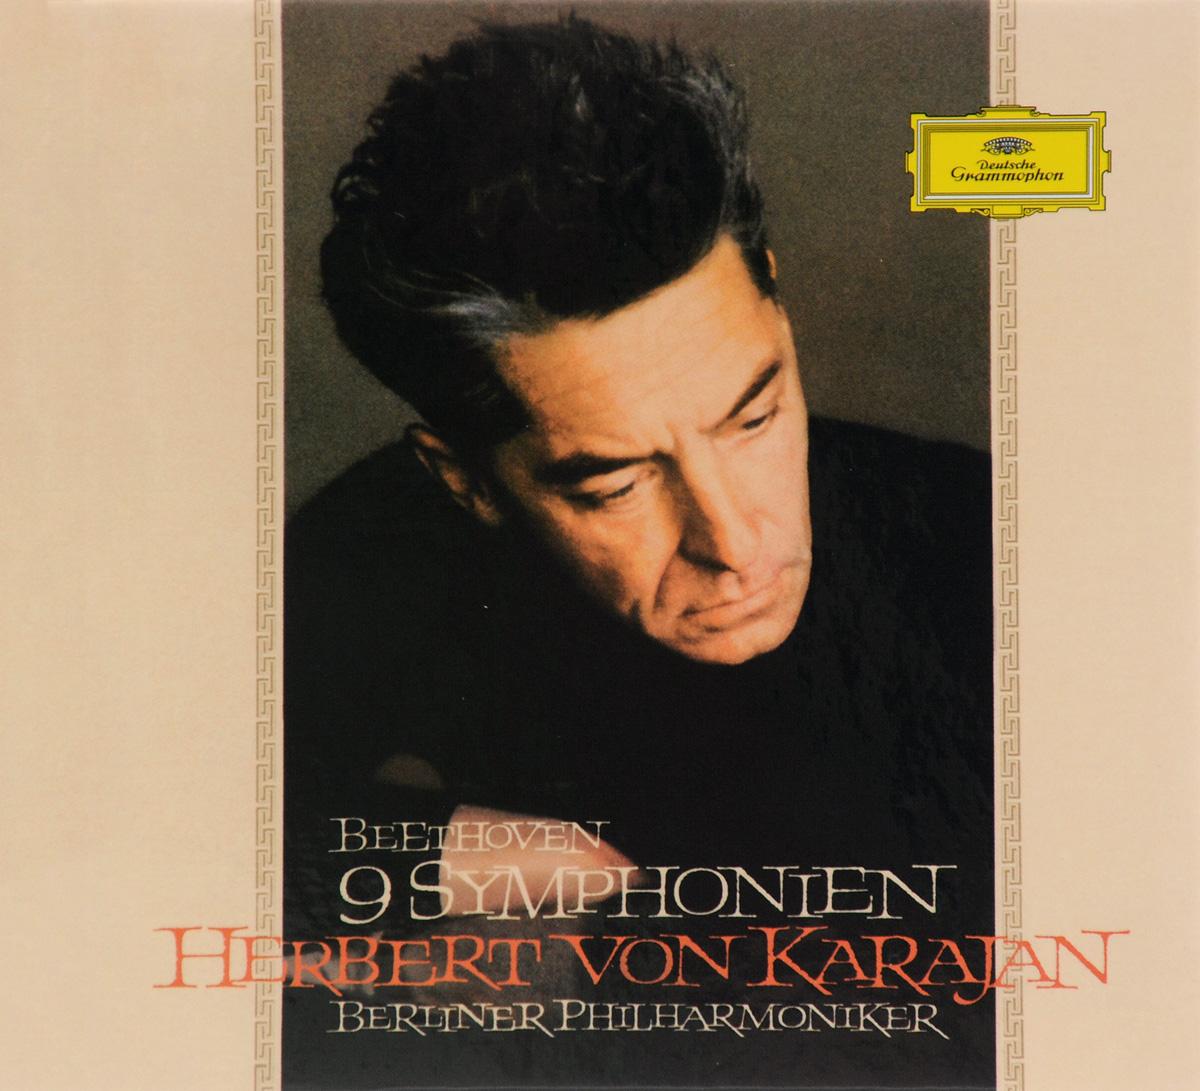 Герберт Караян,Berliner Philharmoniker Herbert Von Karajan, Berliner Philharmoniker. Beethoven. 9 Symphonien идиль бирет майкл понти альфред корто berliner philharmoniker my first lullaby album